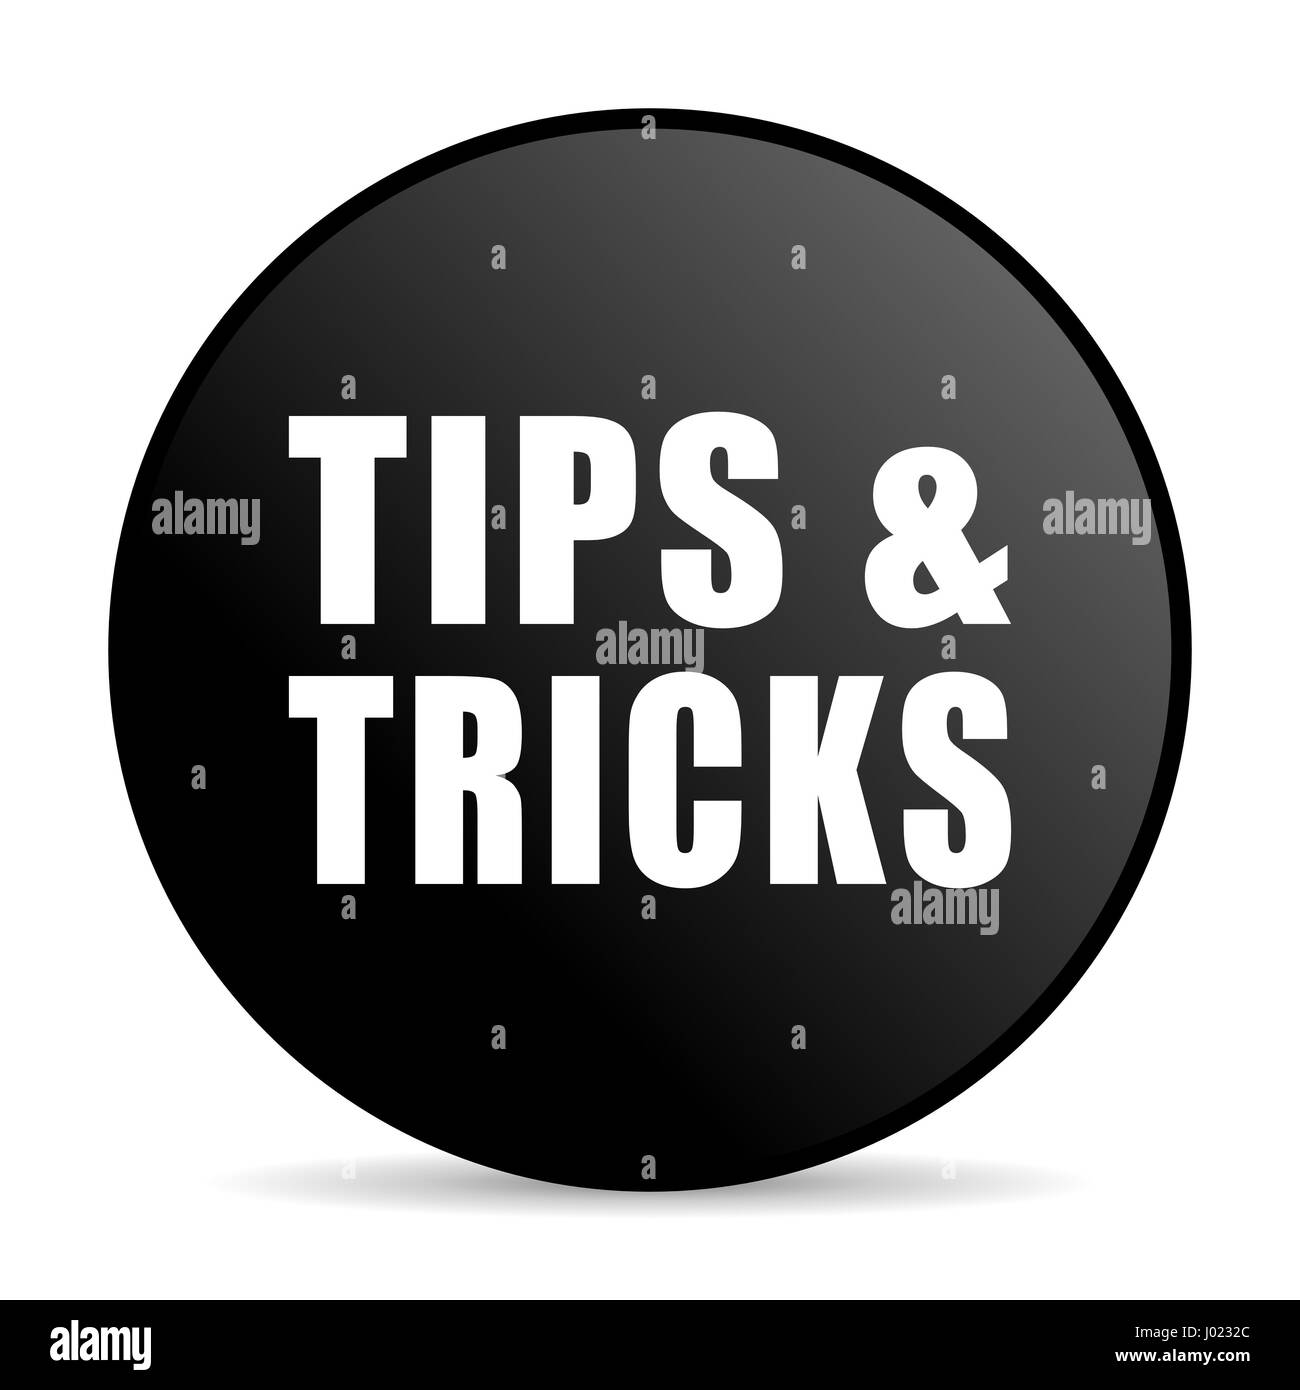 Tips Tricks Black Color Web Design Round Internet Icon On White Stock Photo Alamy